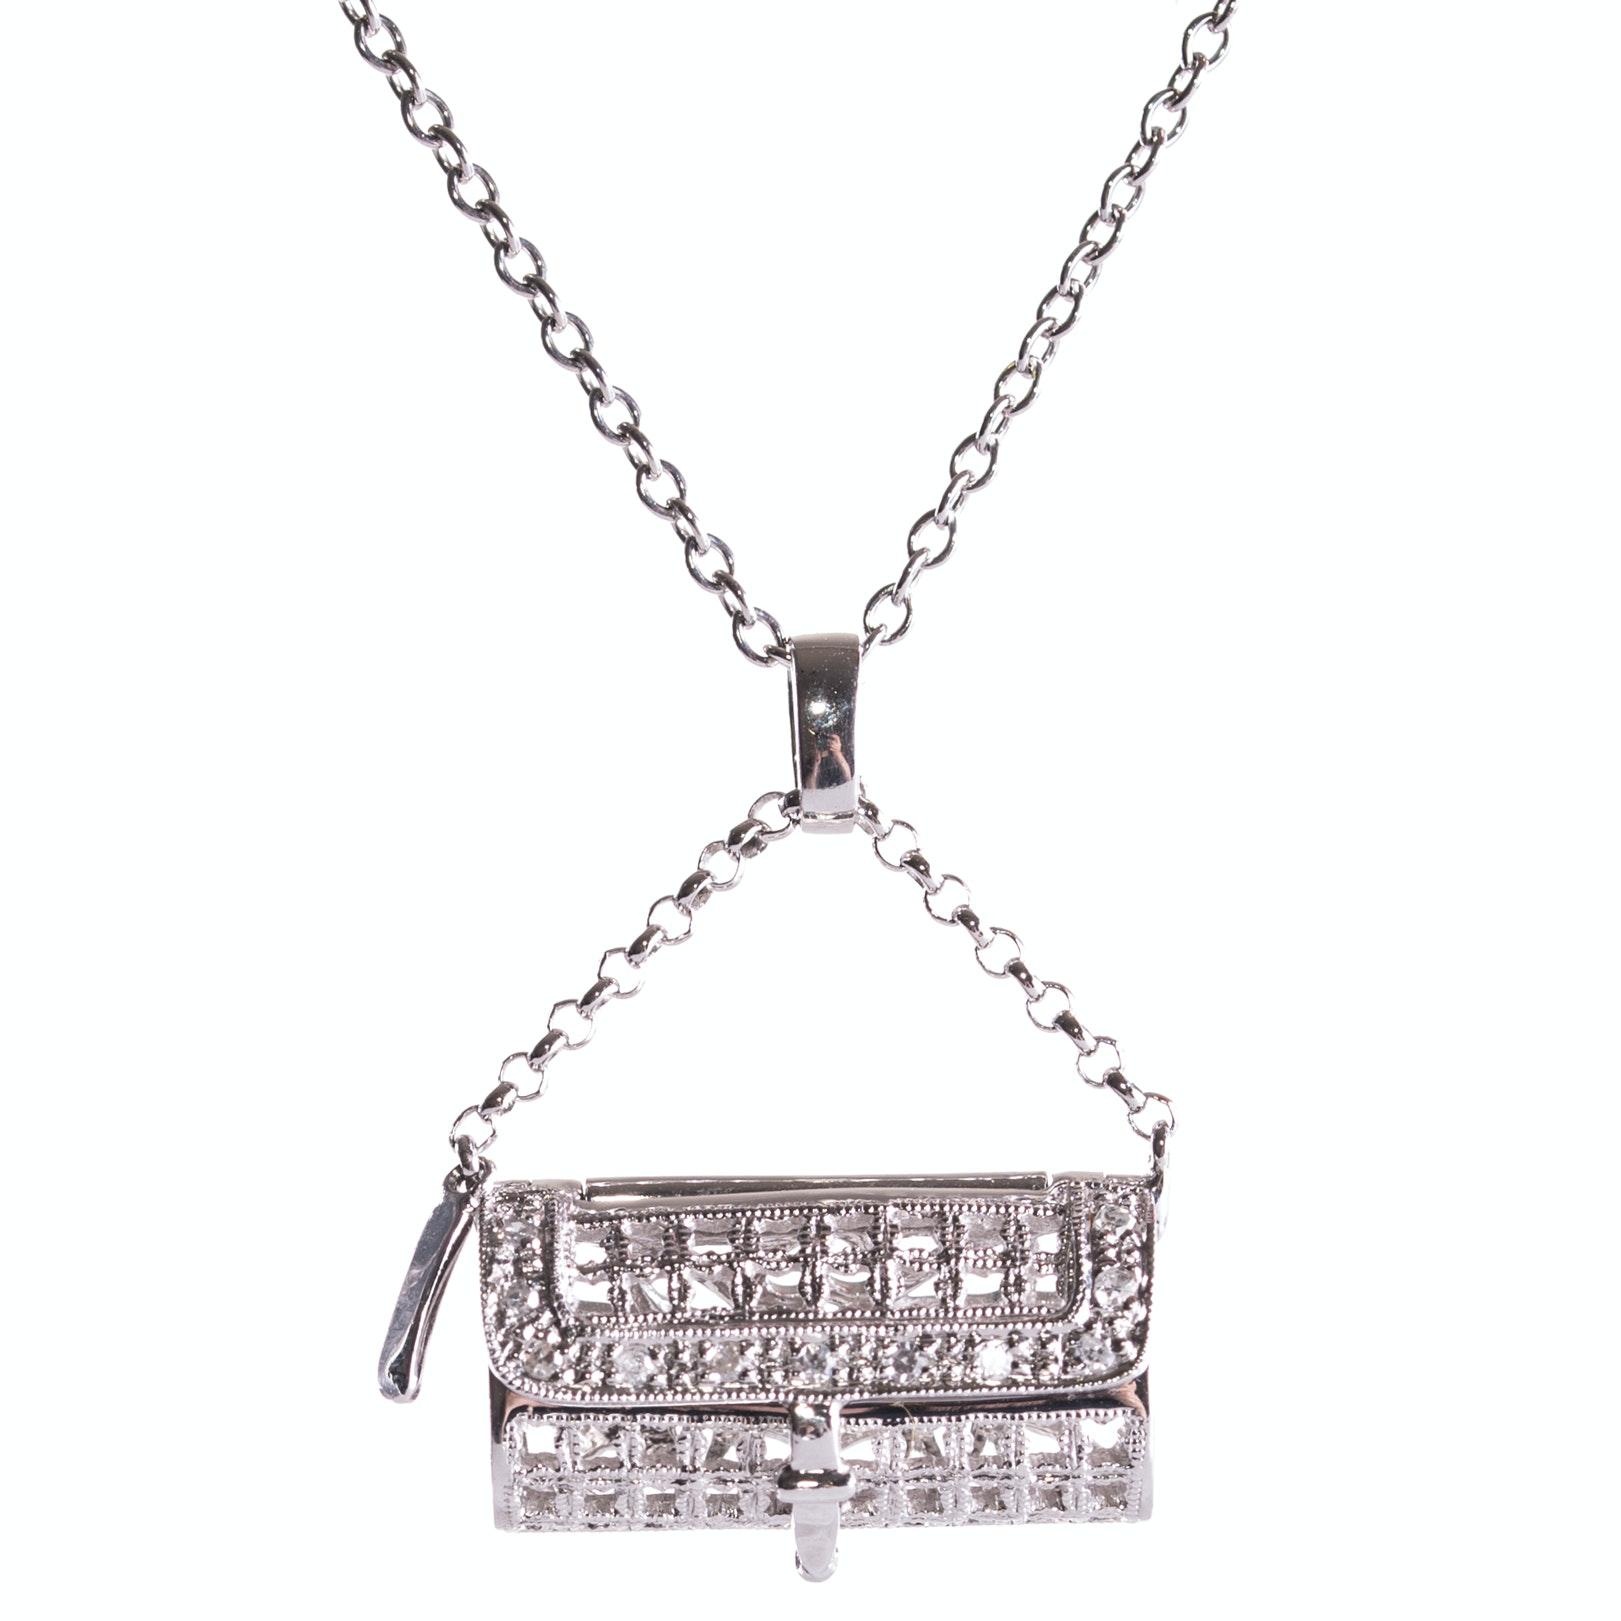 18K White Gold and Diamond Handbag Pendant Necklace